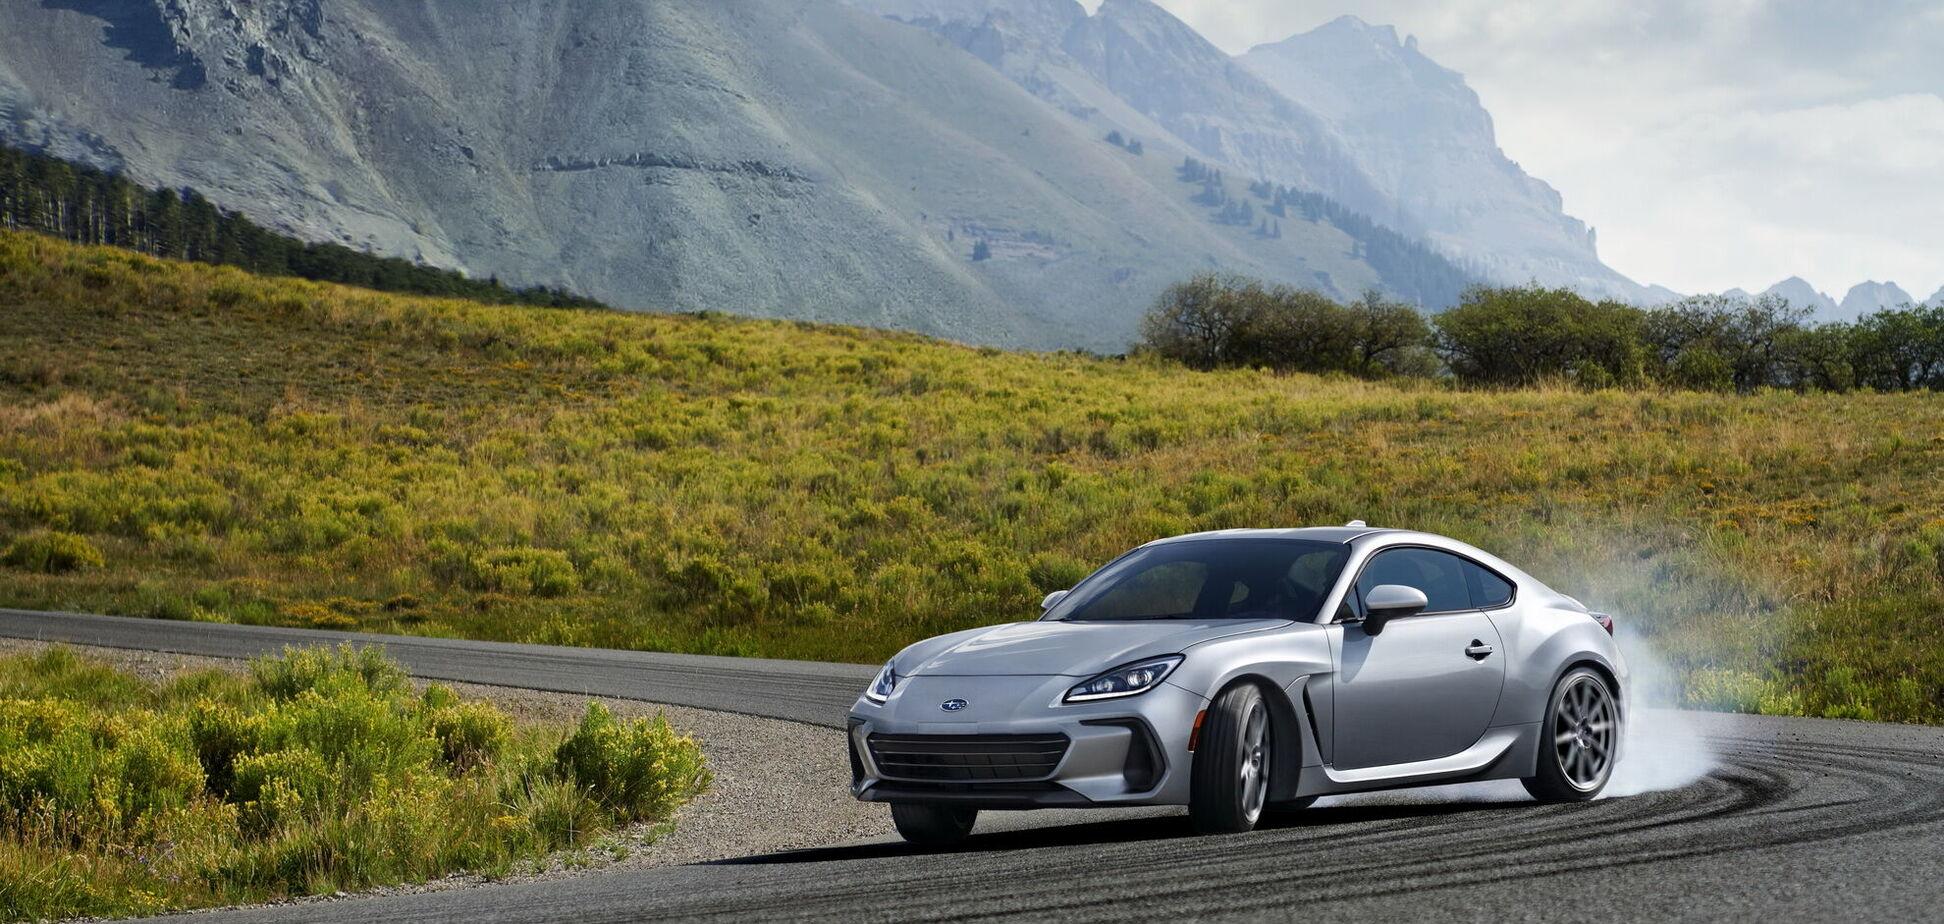 Subaru презентовала новую генерацию купе BRZ